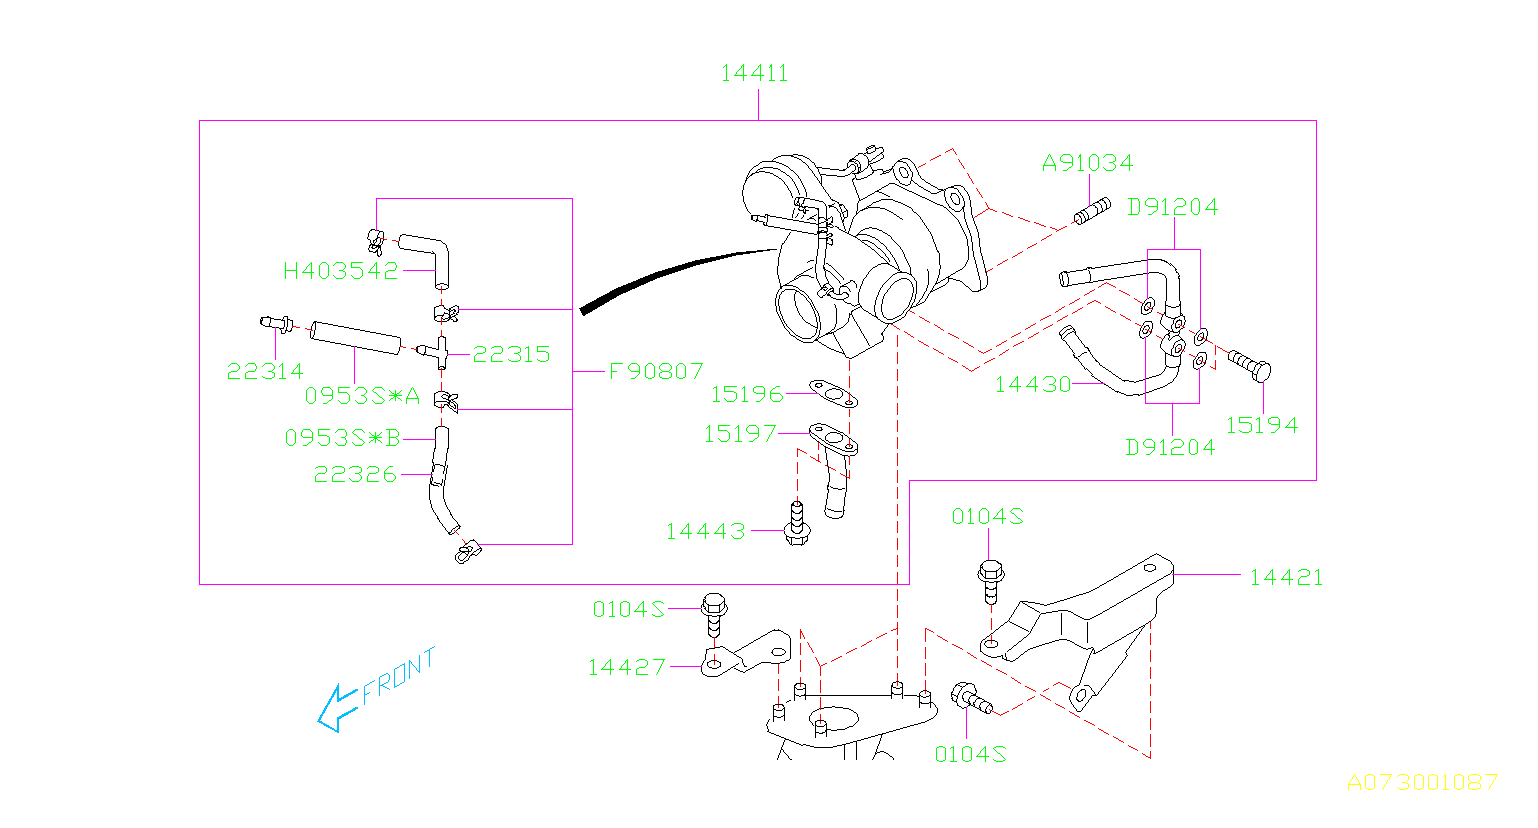 22326ka120 orifice id 1 2 air duct engine cooling Subaru 2 2 Engine Timing Diagram